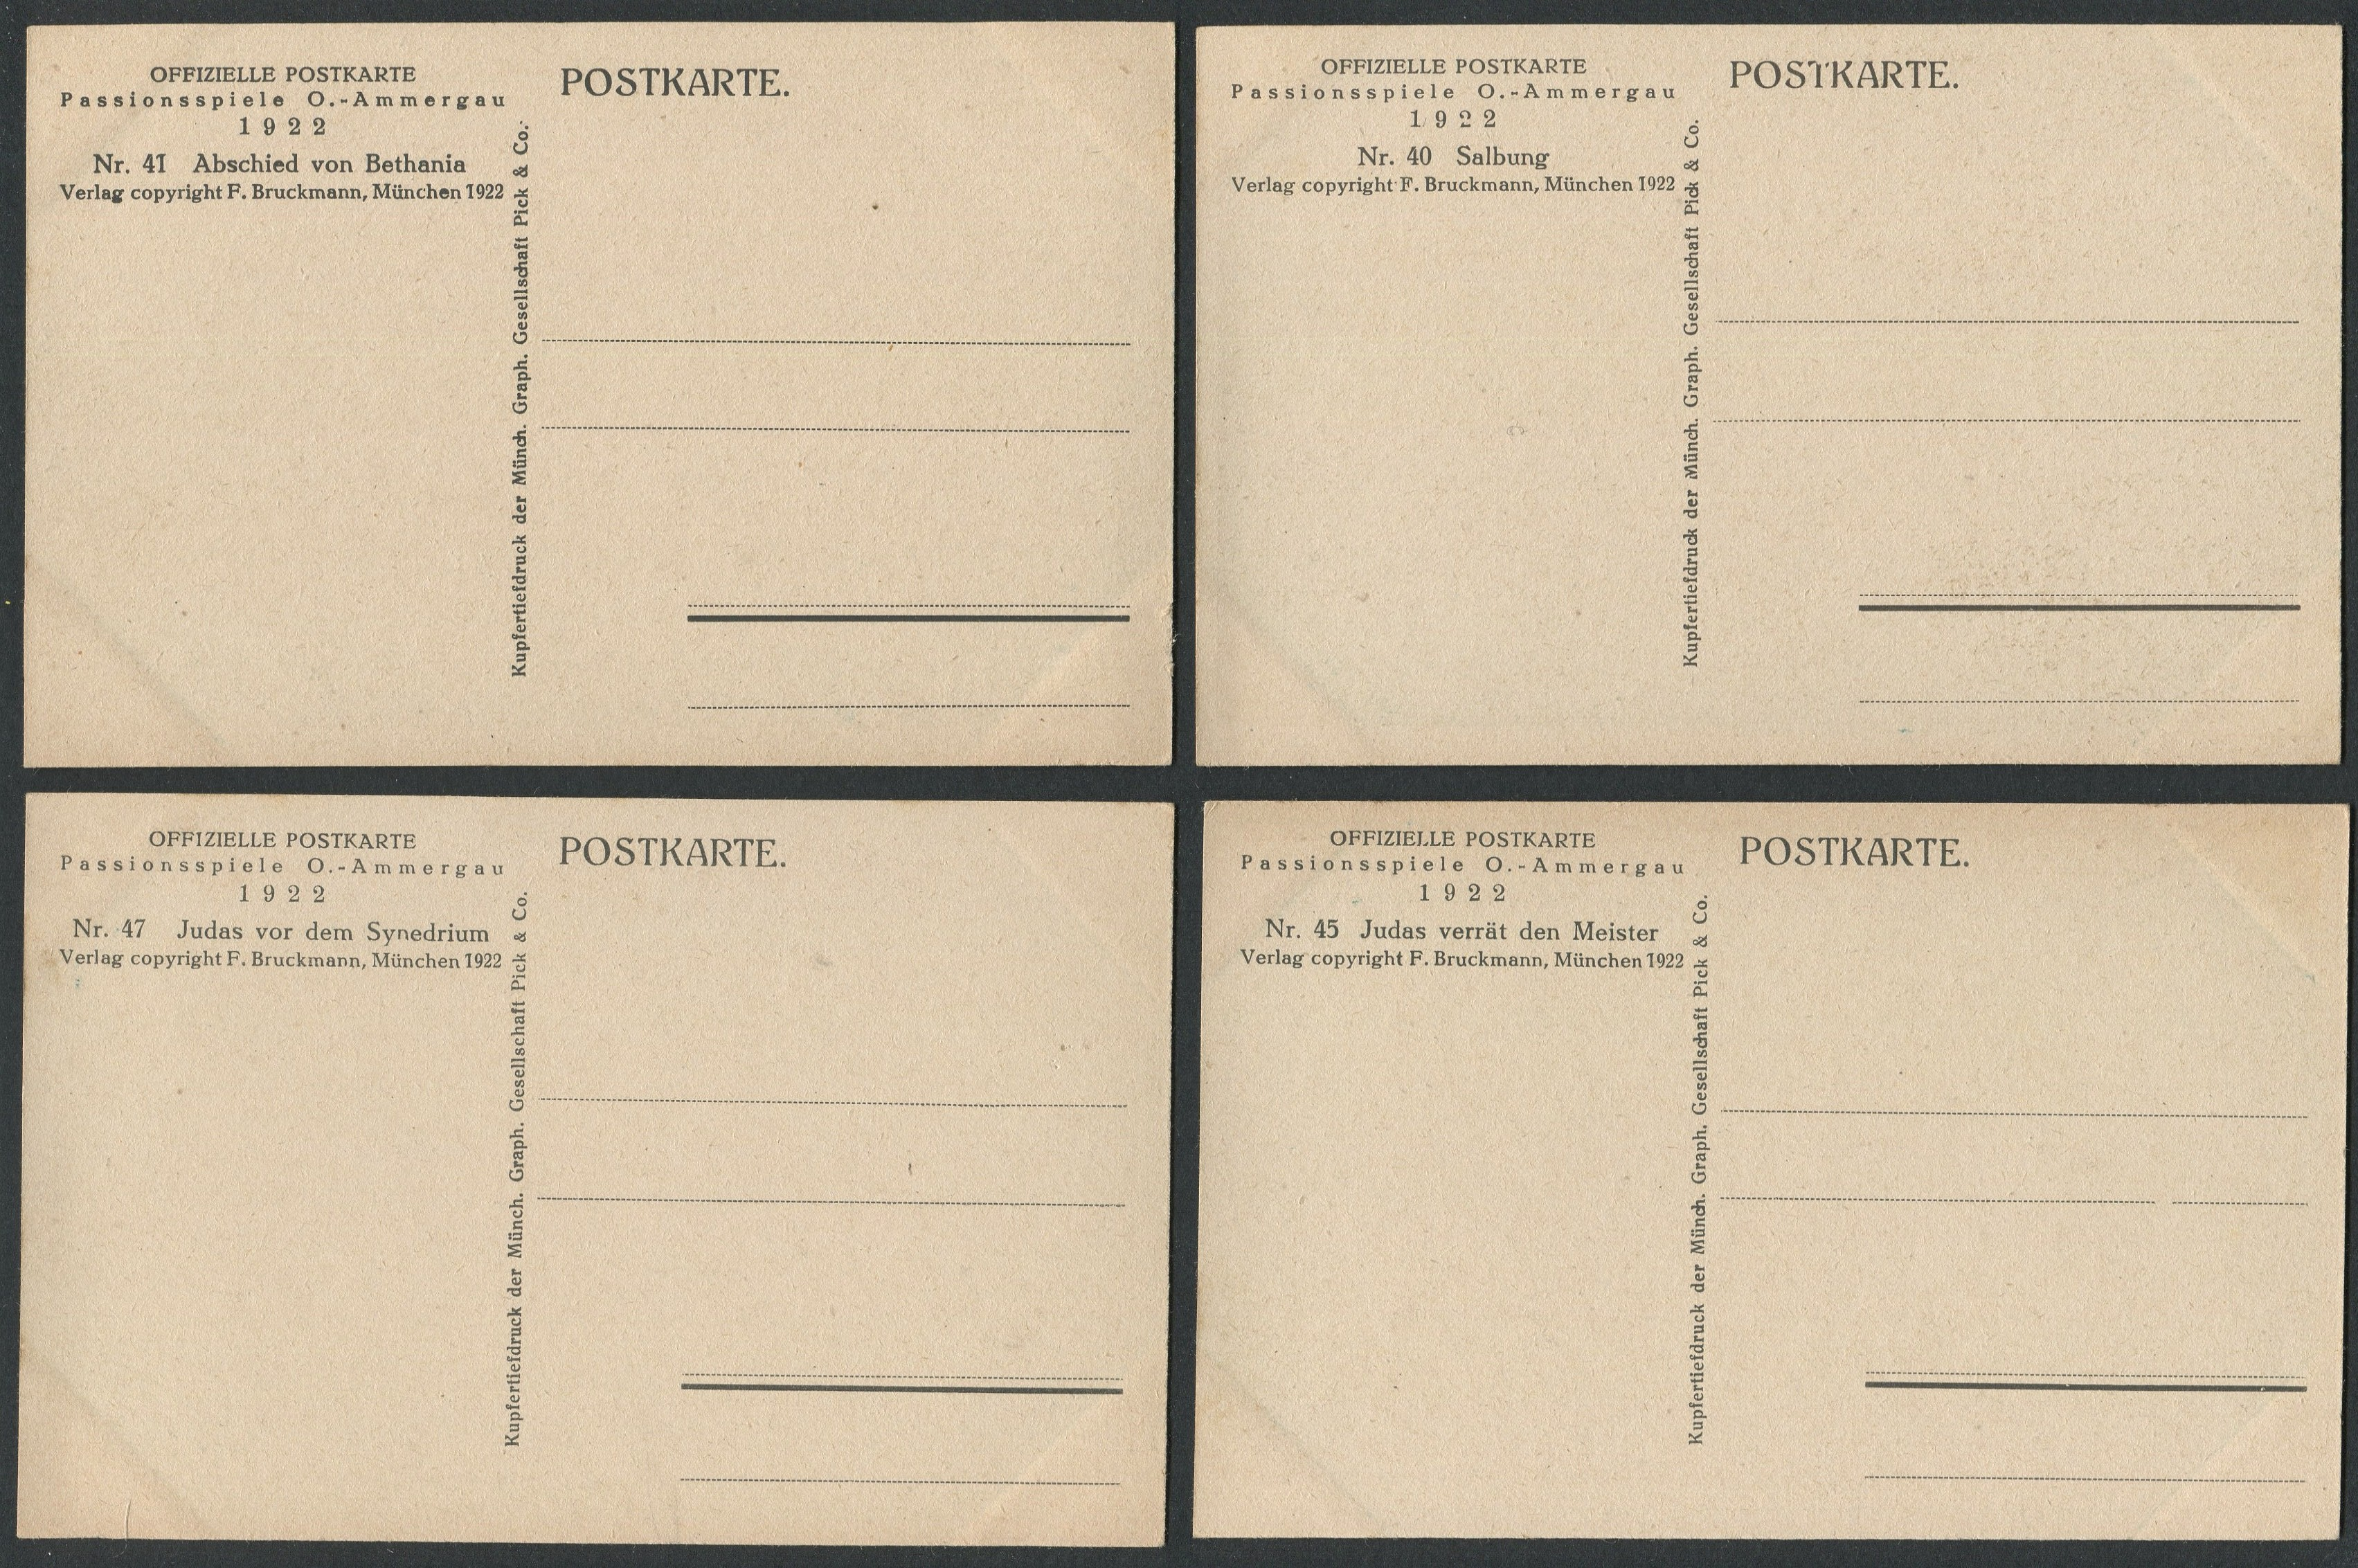 Lot 40 - FOUR VINTAGE POSTCARDS OFFIZIELLE POSTKARTE 1922 PASSIONSSPIELE O AMMERGAU